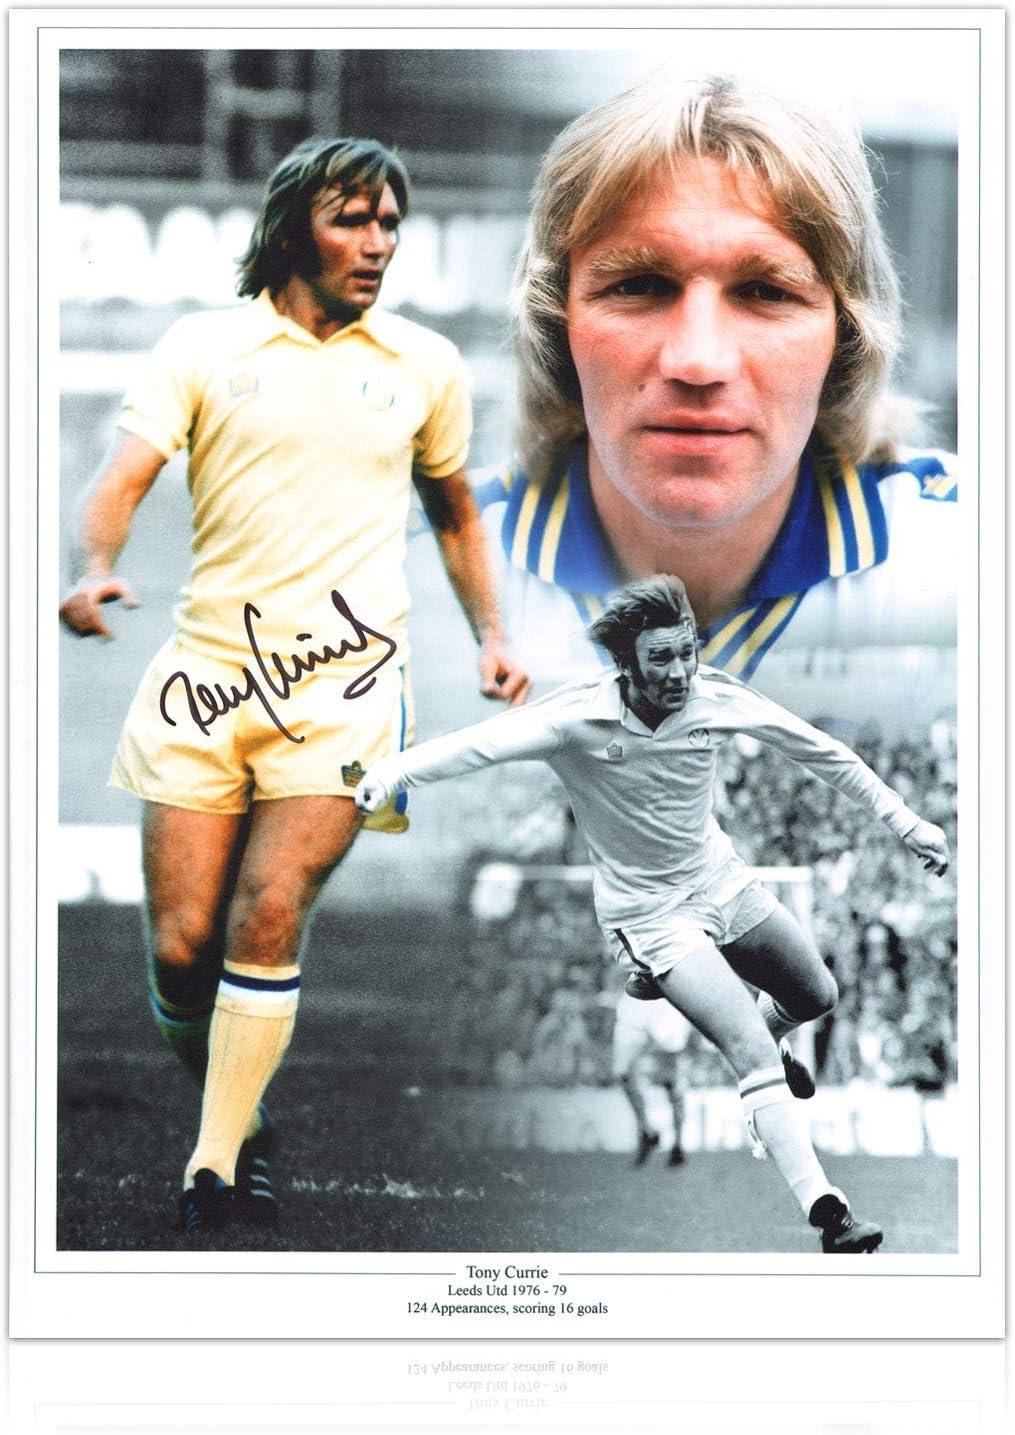 Exclusive Memorabilia Tony Currie Signed Leeds United Photo